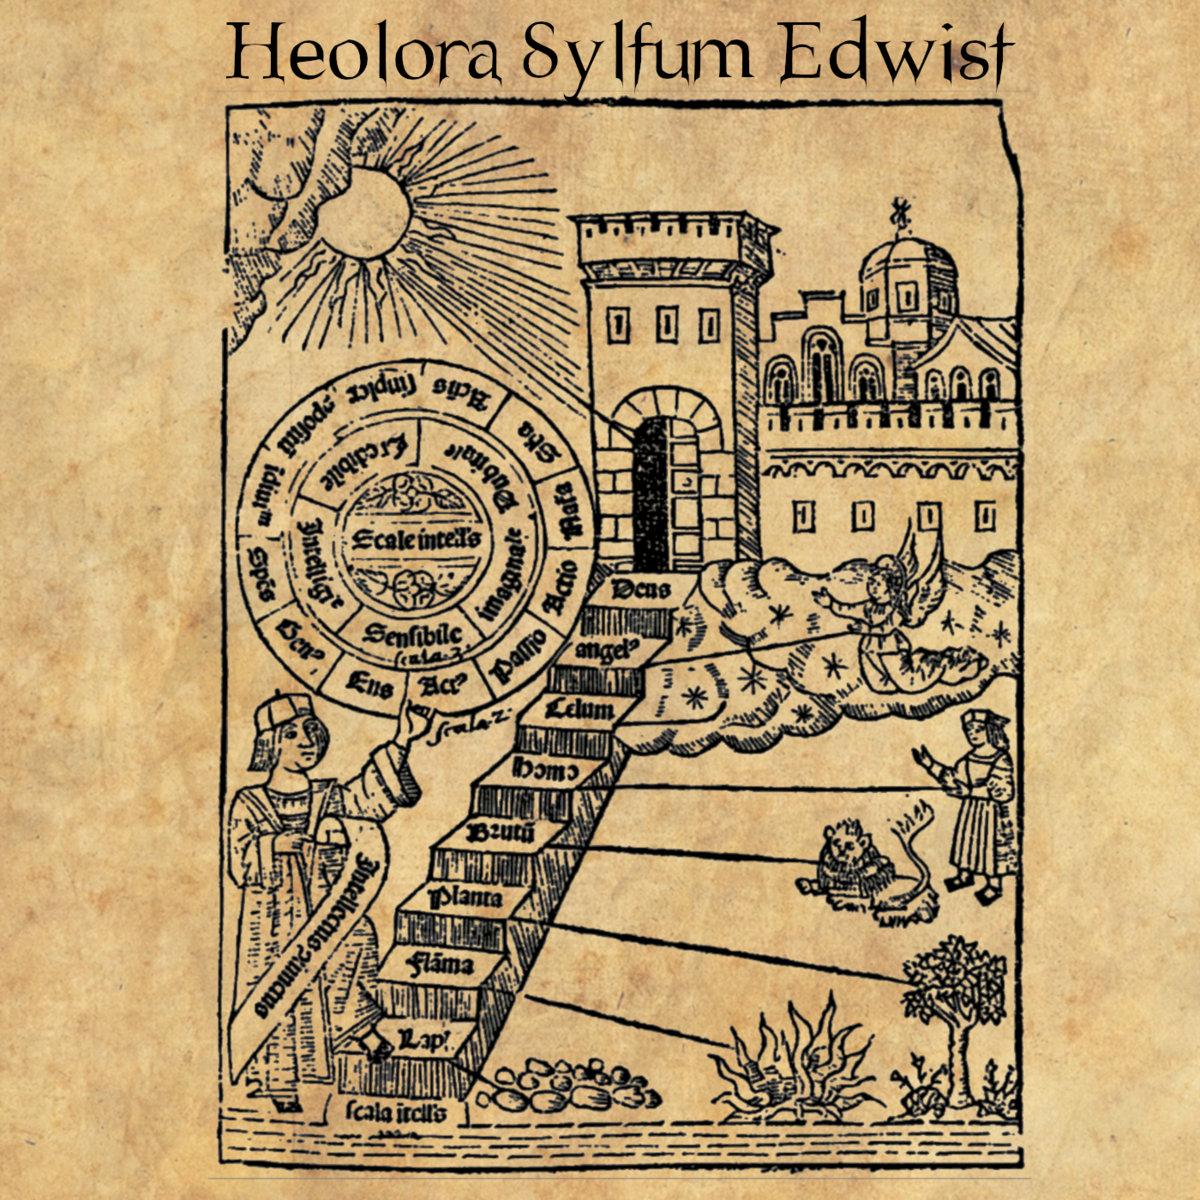 Heolora Sylfum Edwist